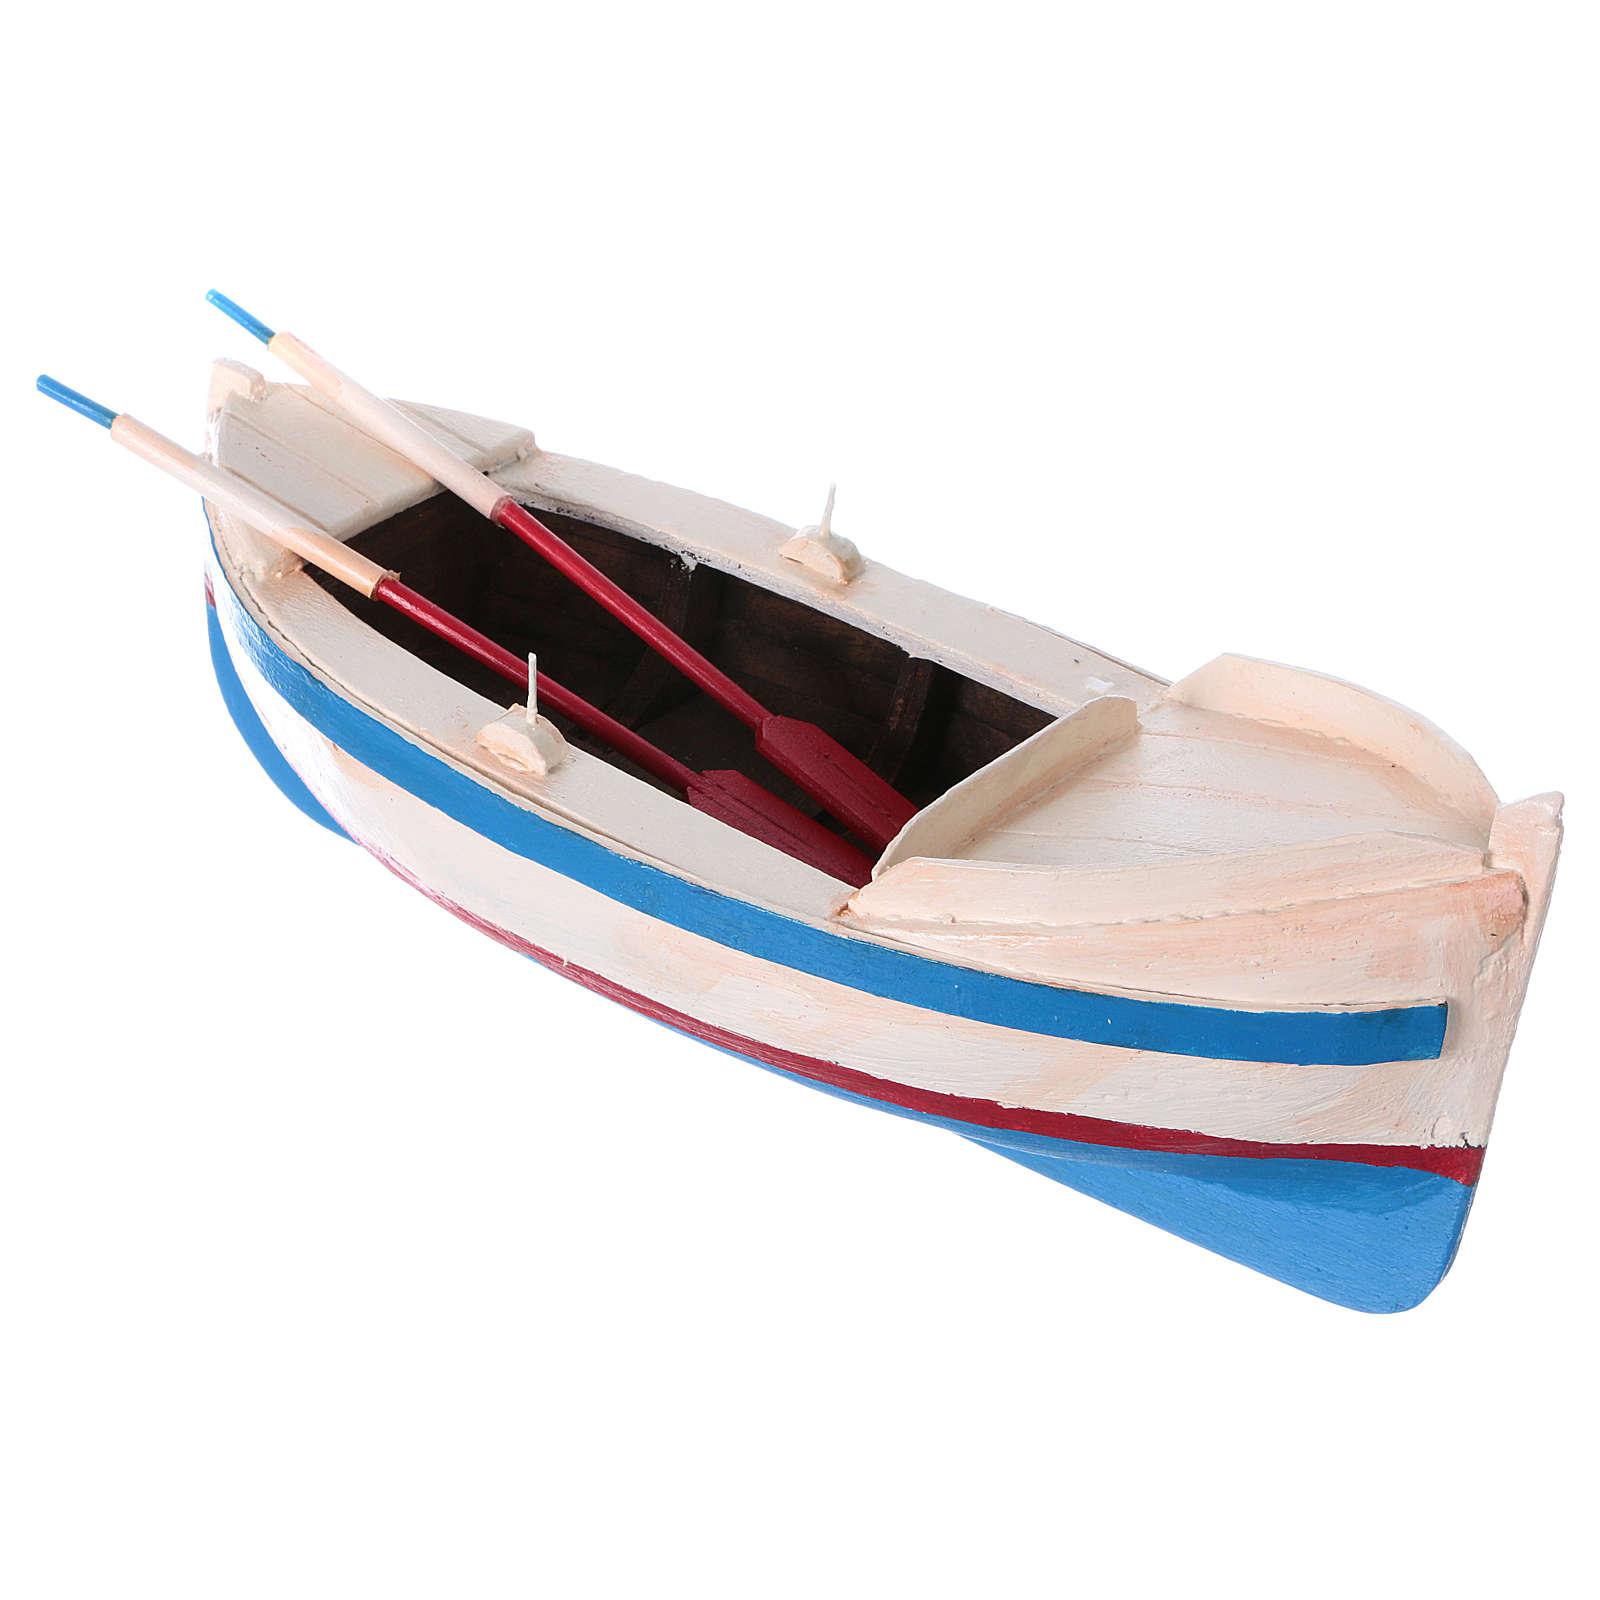 Skiff in wood with oars for Nativity Scene 12 cm 4